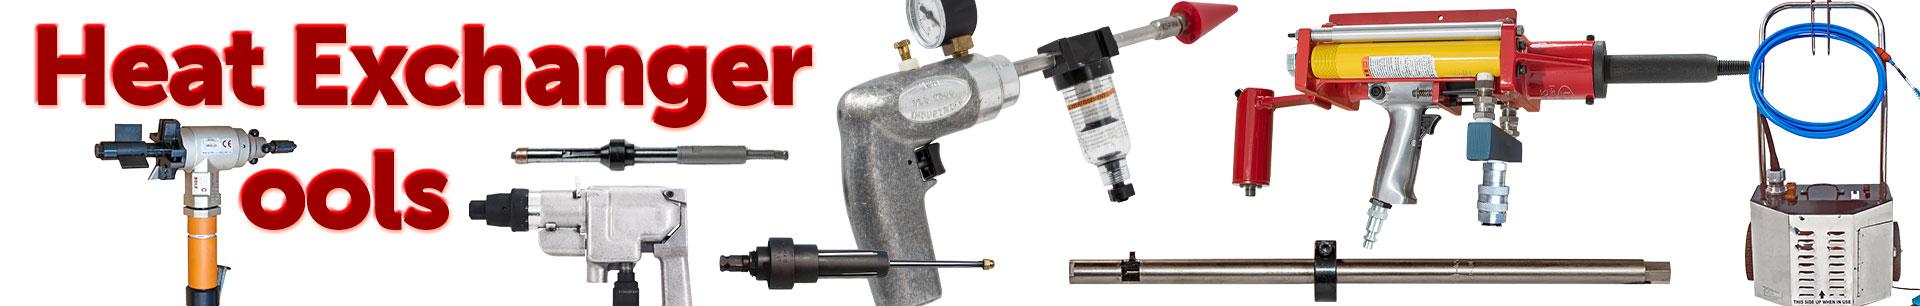 USA-Industries-Heat-Exchanger-Tooling-Slider-Hero